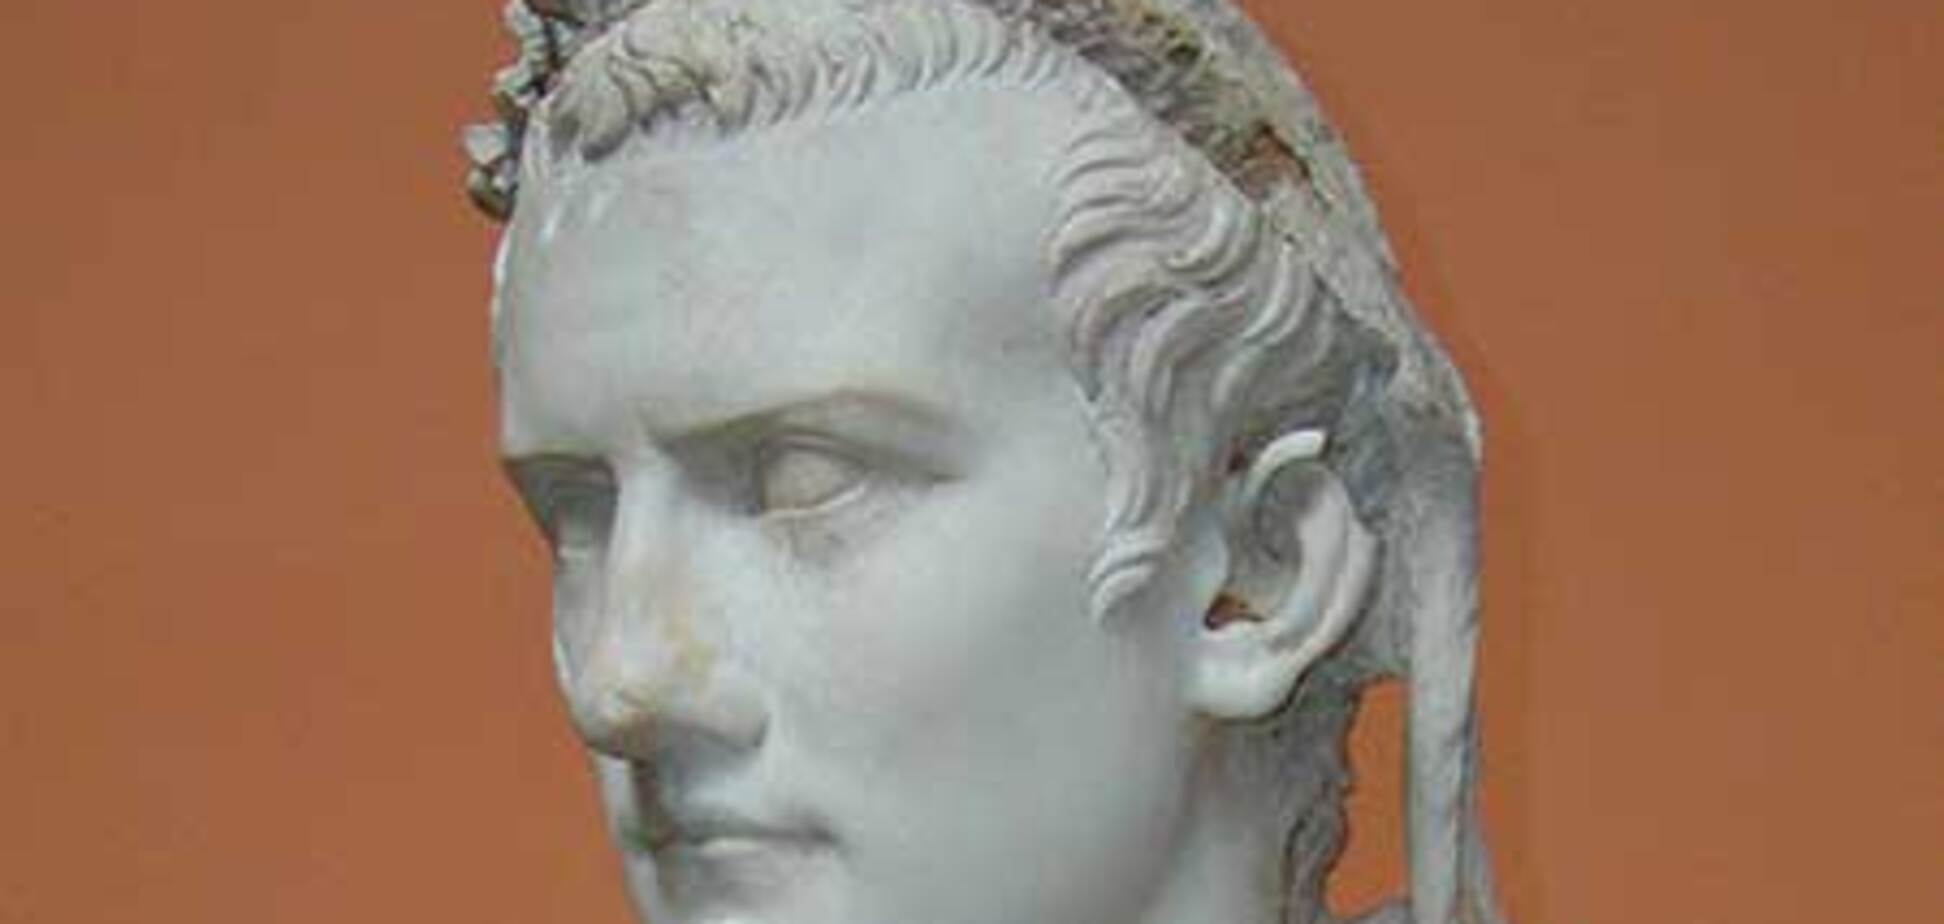 Благодаря 'черному археологу', найдена гробница Калигулы